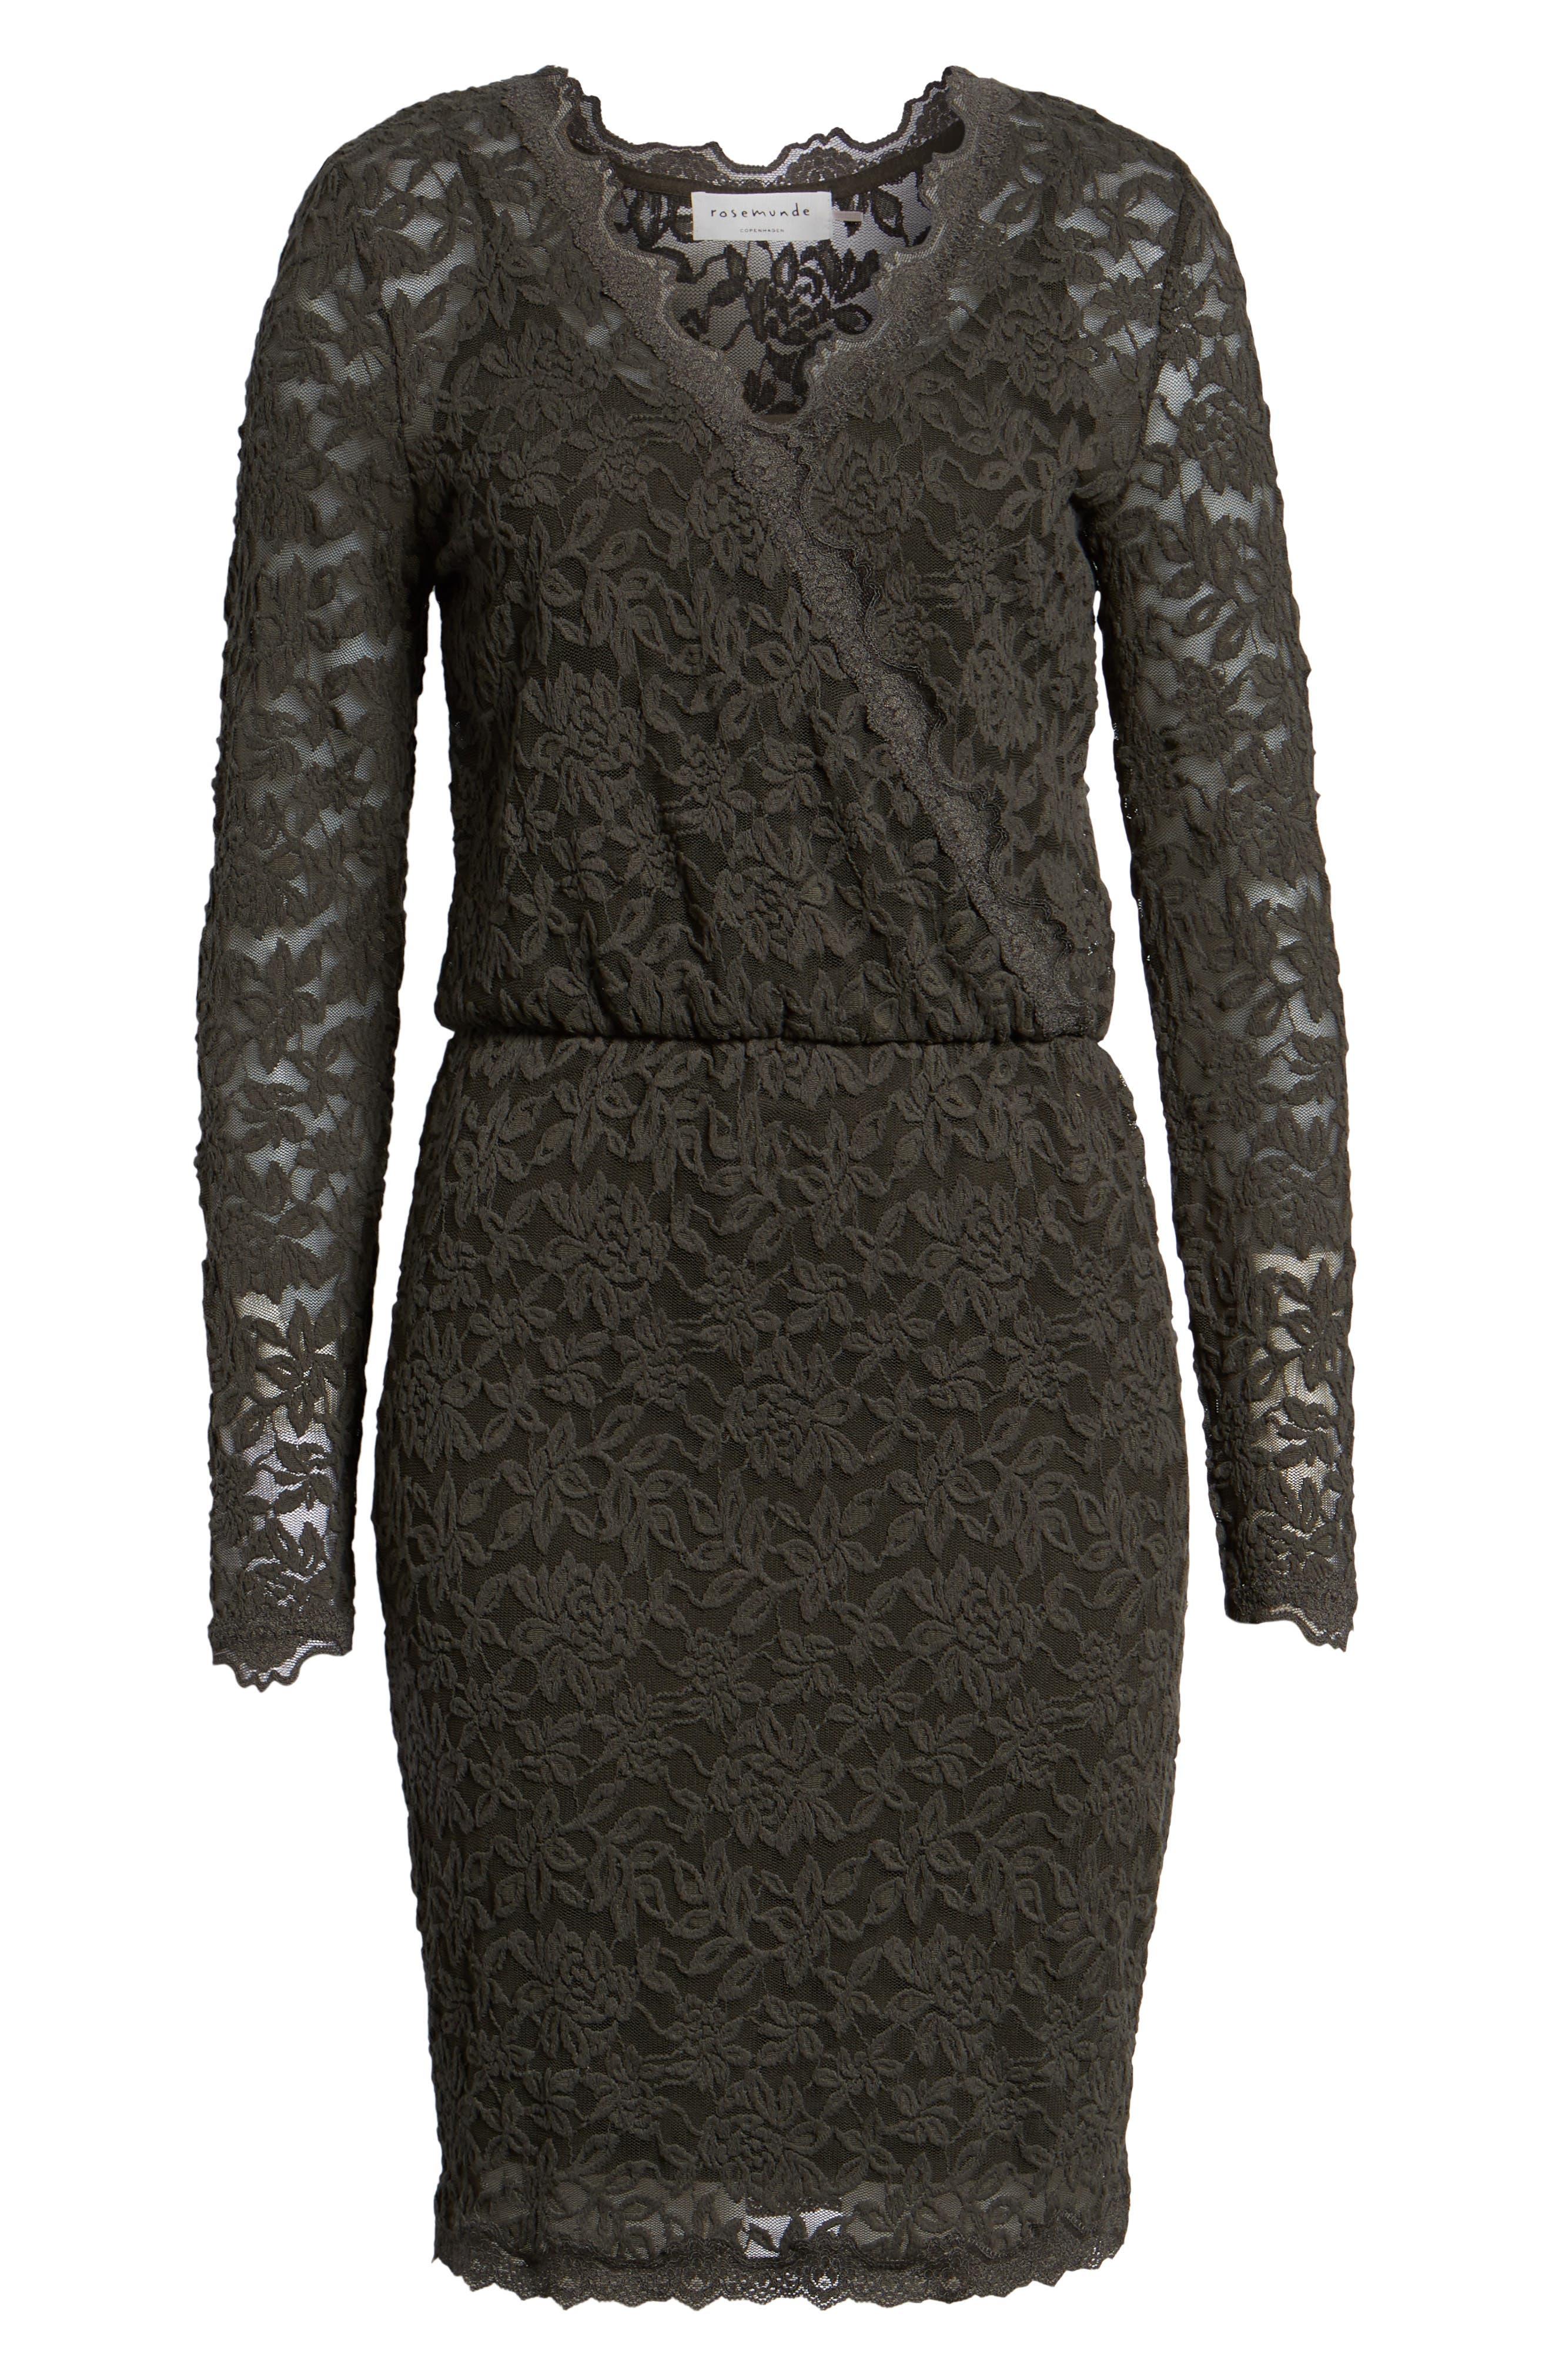 ROSEMUNDE, Delicia Scallop Detail Cotton Blend Lace Dress, Alternate thumbnail 7, color, DARK FOREST